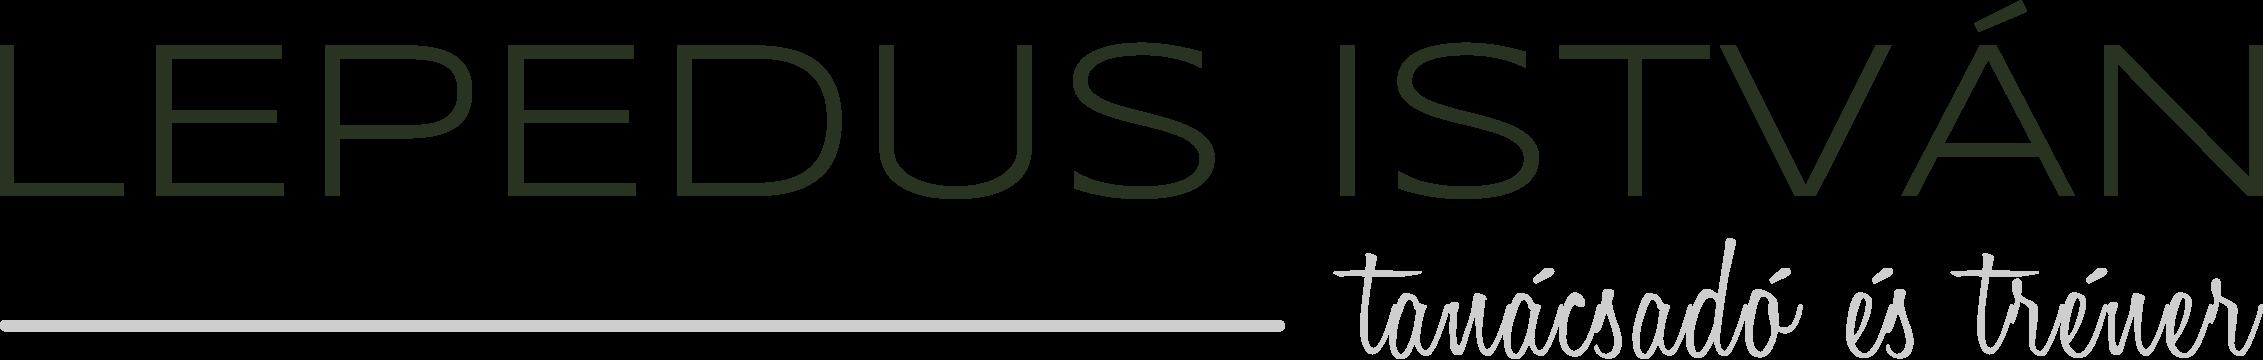 Lepedus_istvan-logo-white